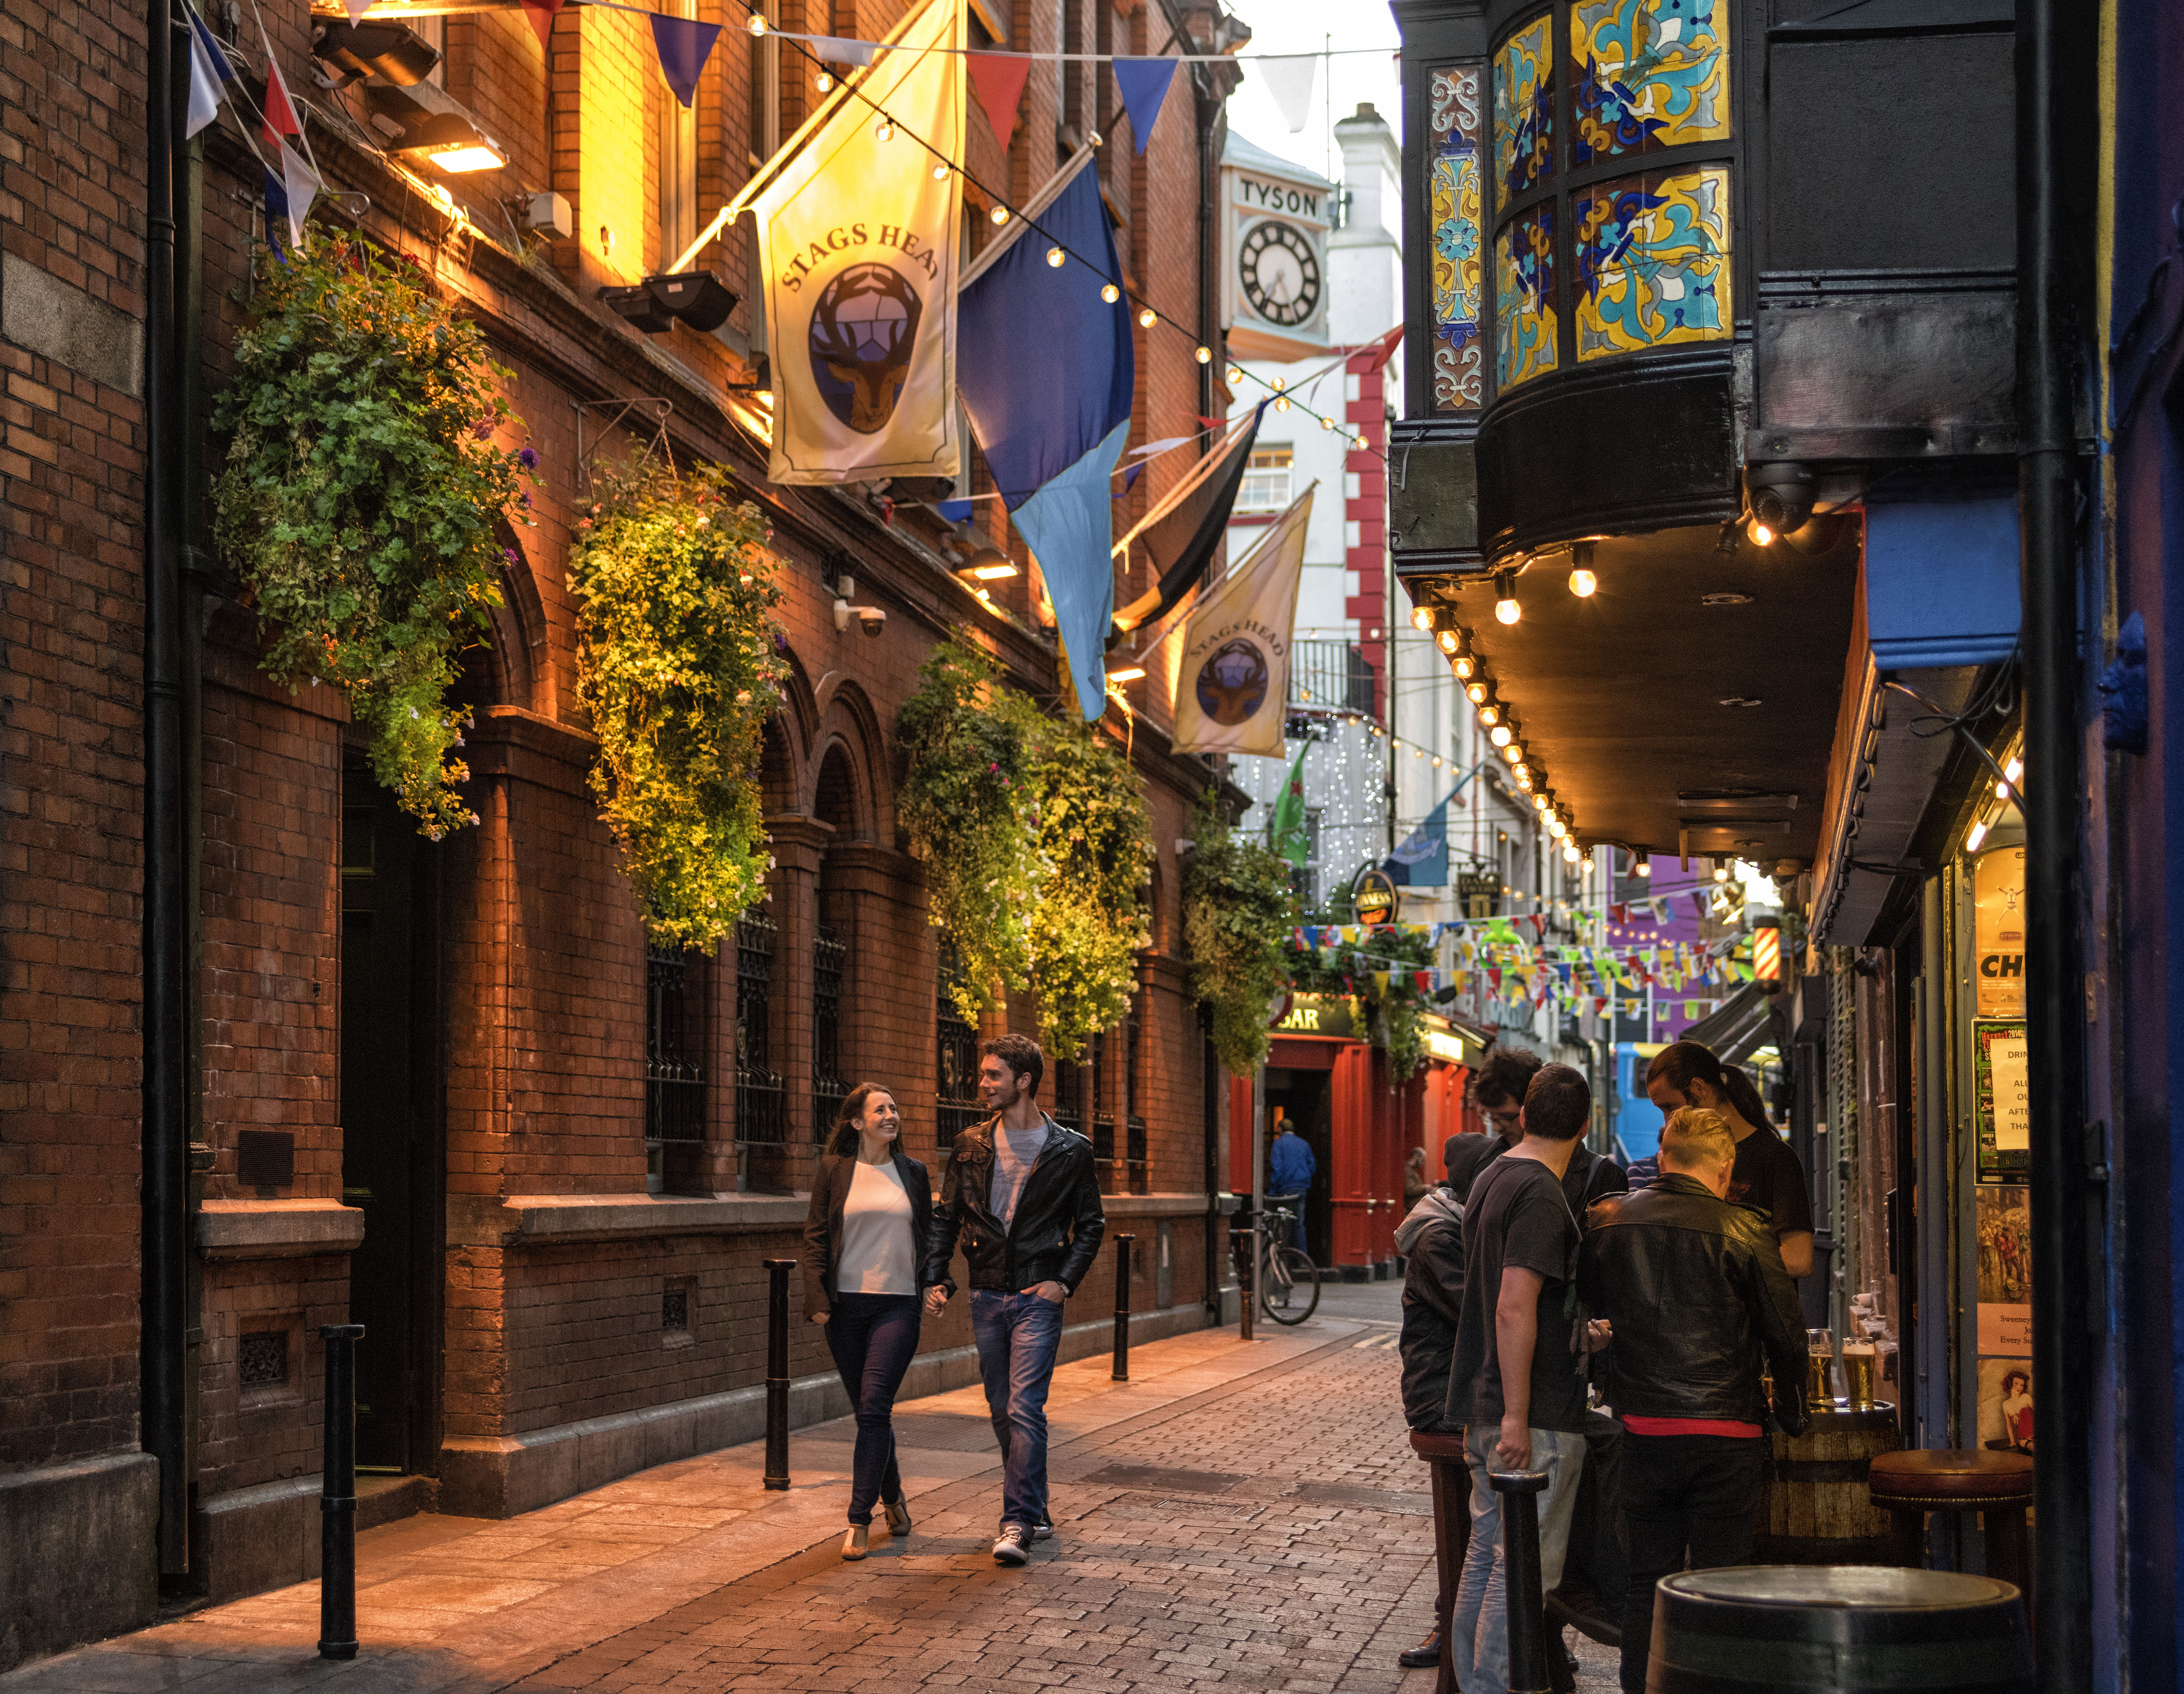 Dublin Städtereise, Echt Irland